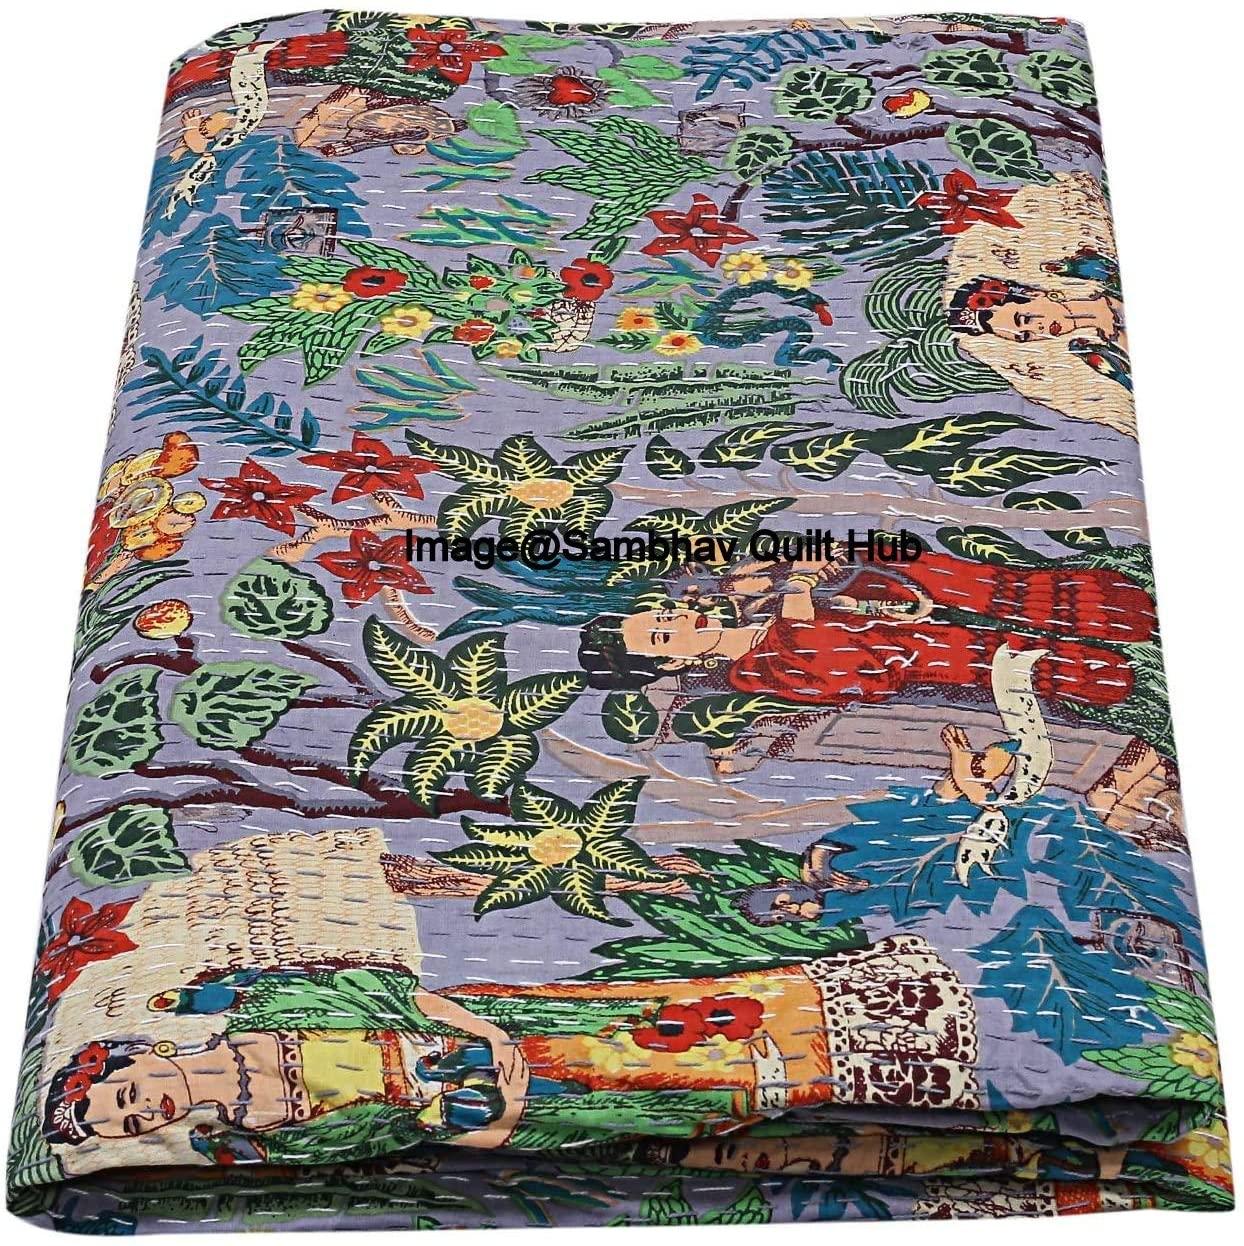 Sambhav Quilt Hub Handmade Quilted Blanket Indian Cotton Frida Khalo Print Bedspread Kantha Work Bohemian Bed Decor Throw Blanket Twin/King/Queen (60X90 inches)